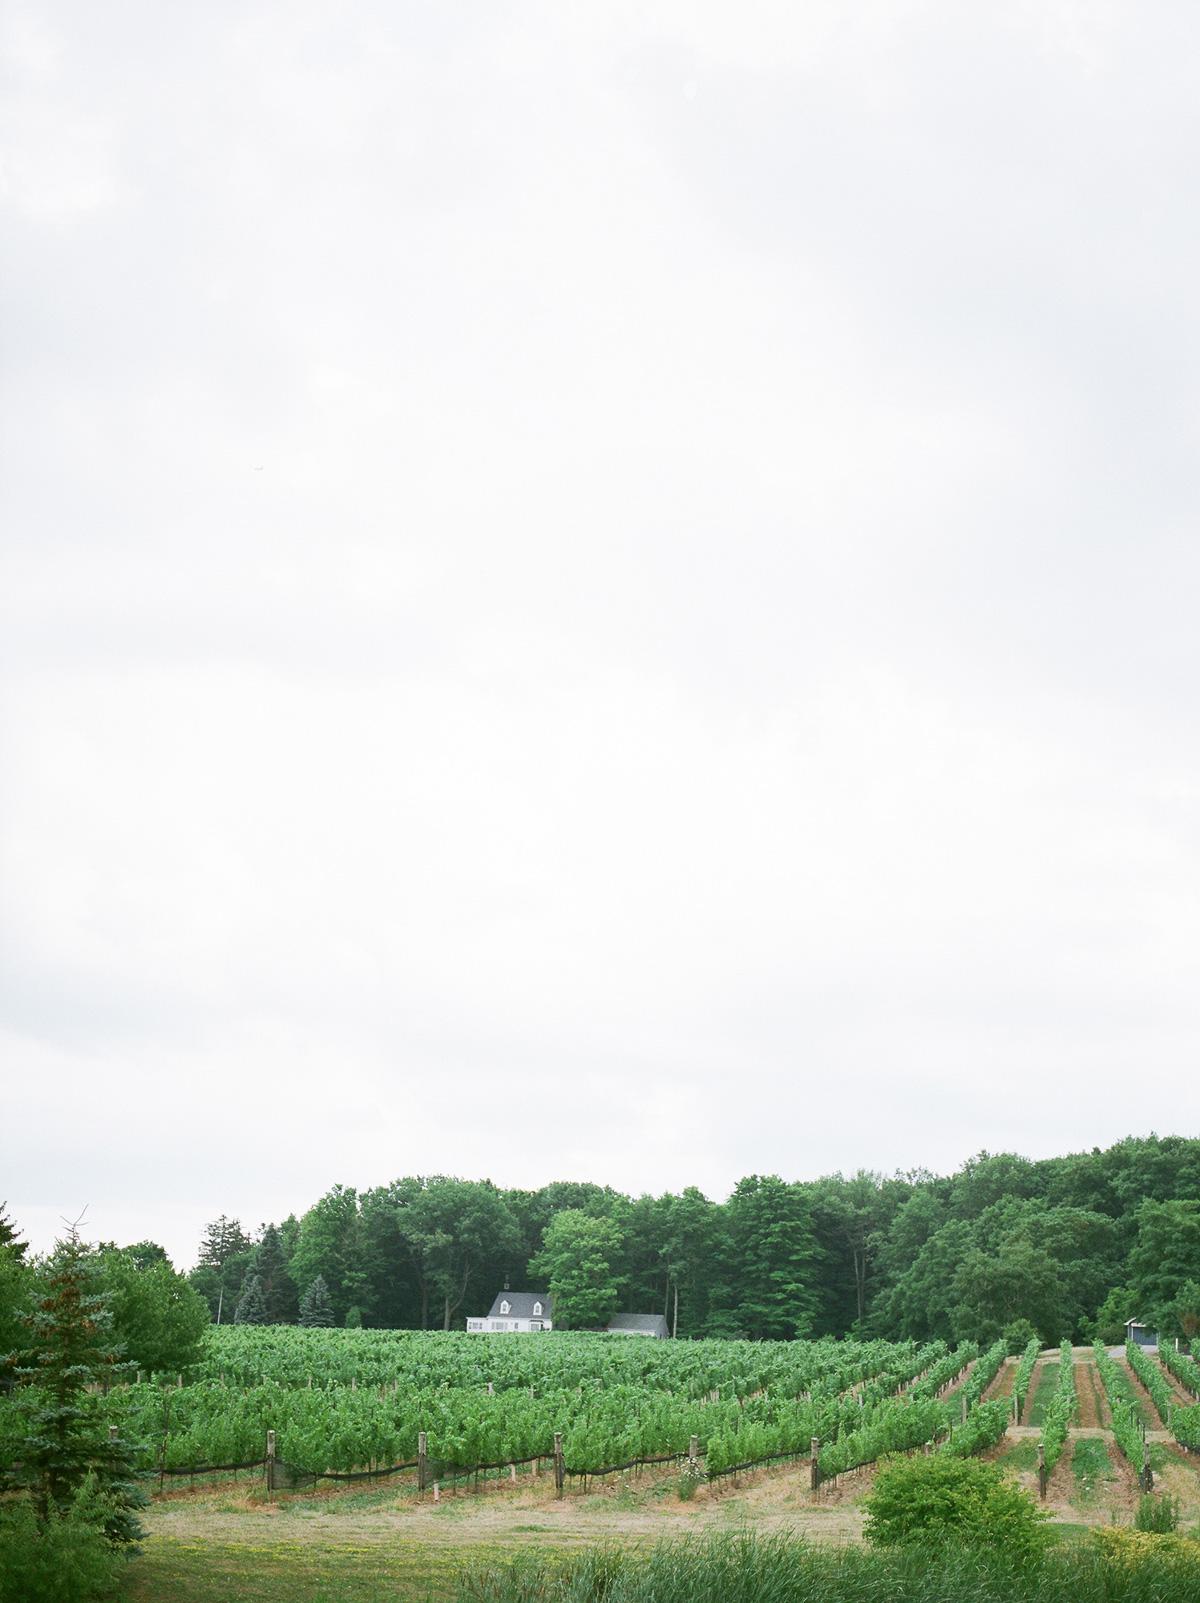 jennifer-xu-photography-vineyard-bride-swish-list-rosewod-eatstes-winery-beamsville-wedding-editorial-20.jpg